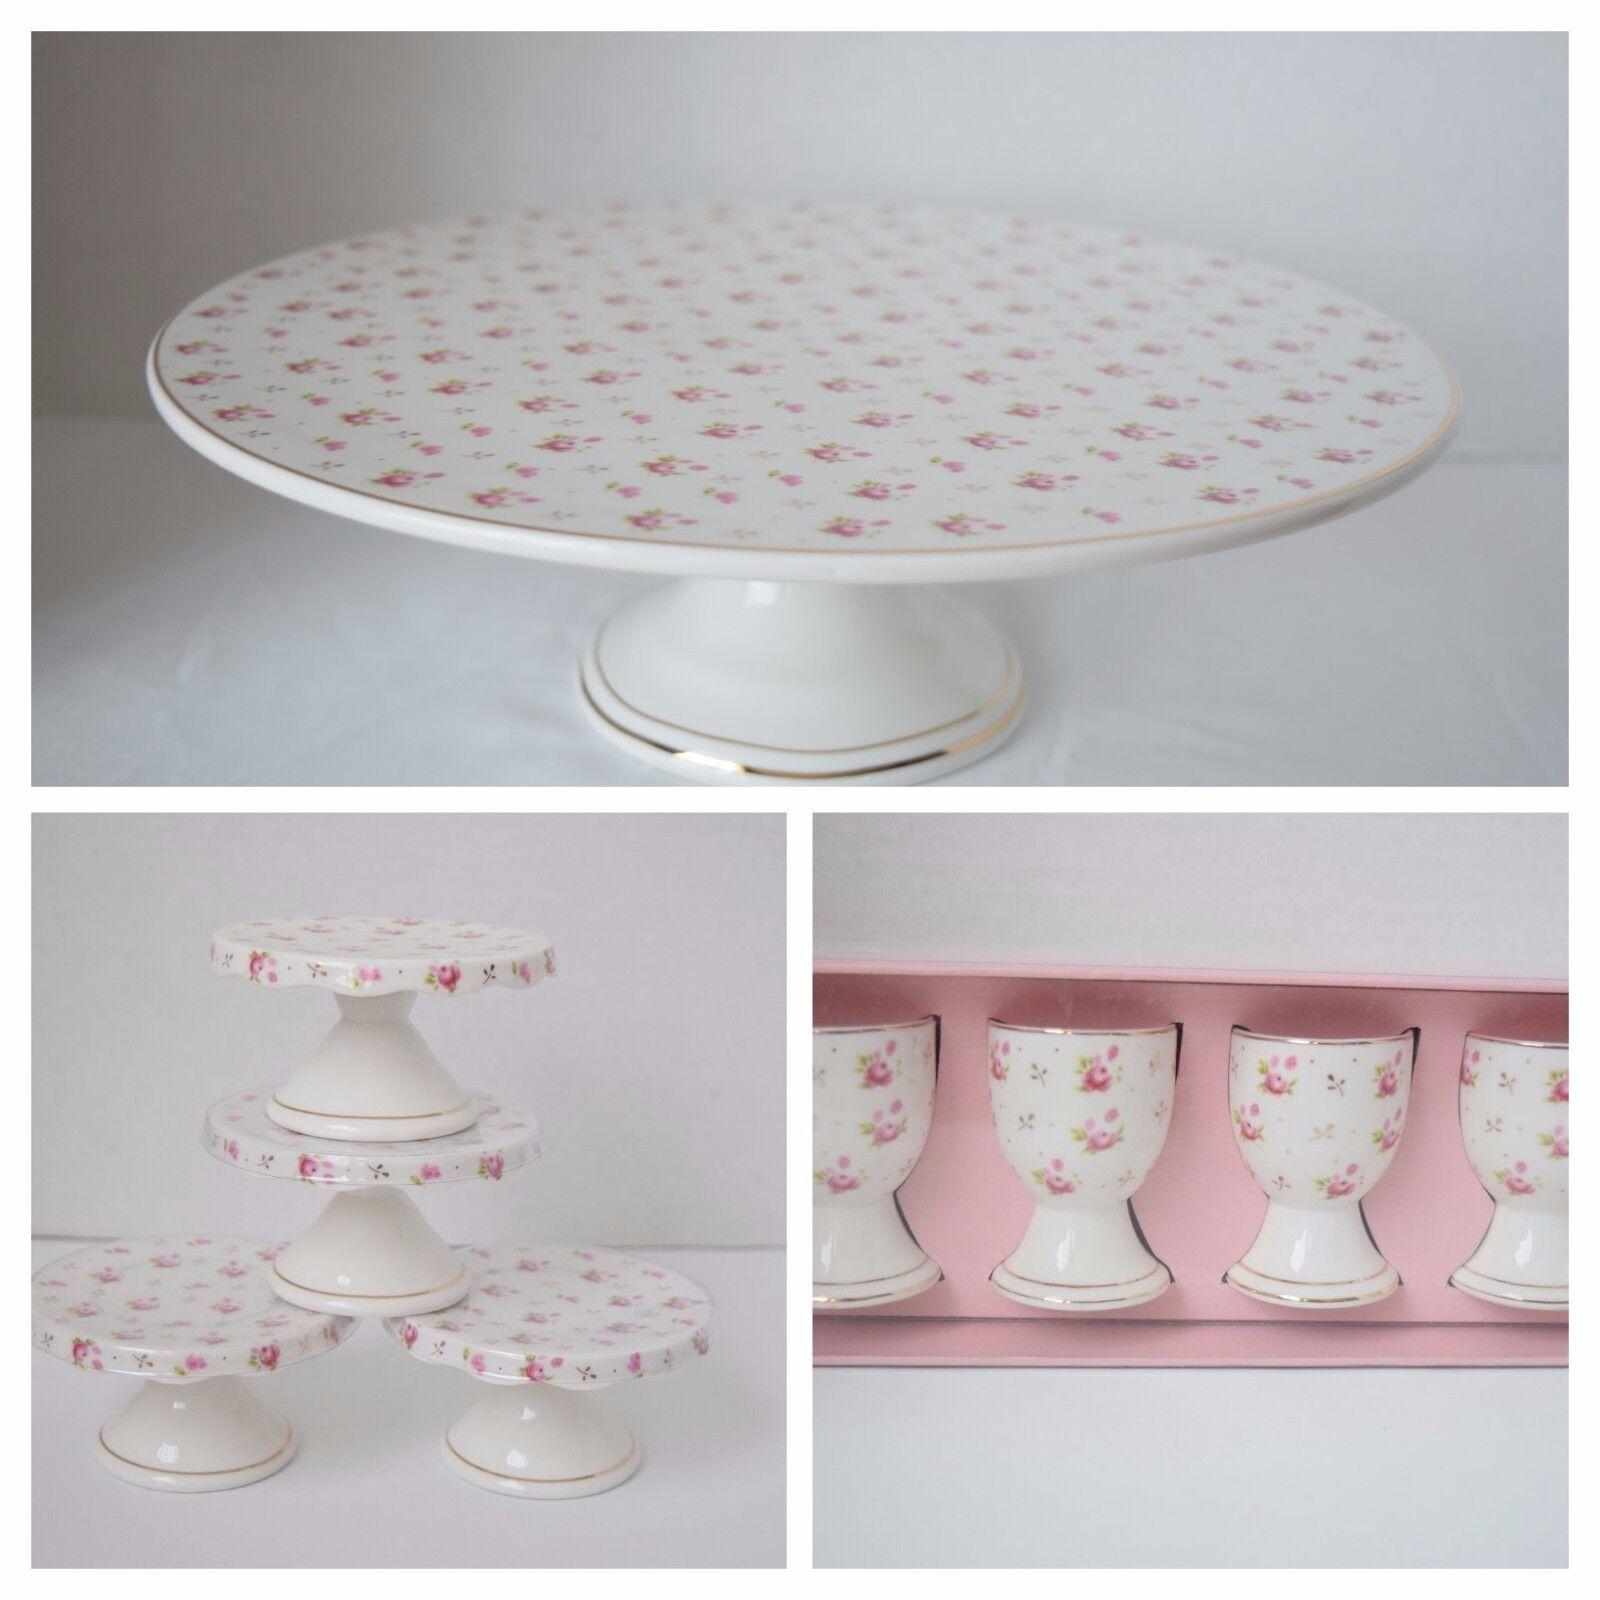 Nouveau GRACE TEAWARE Victorian rose Rose Gateau Cupcake Stand Egg Cup Holder 9 Pieces Set